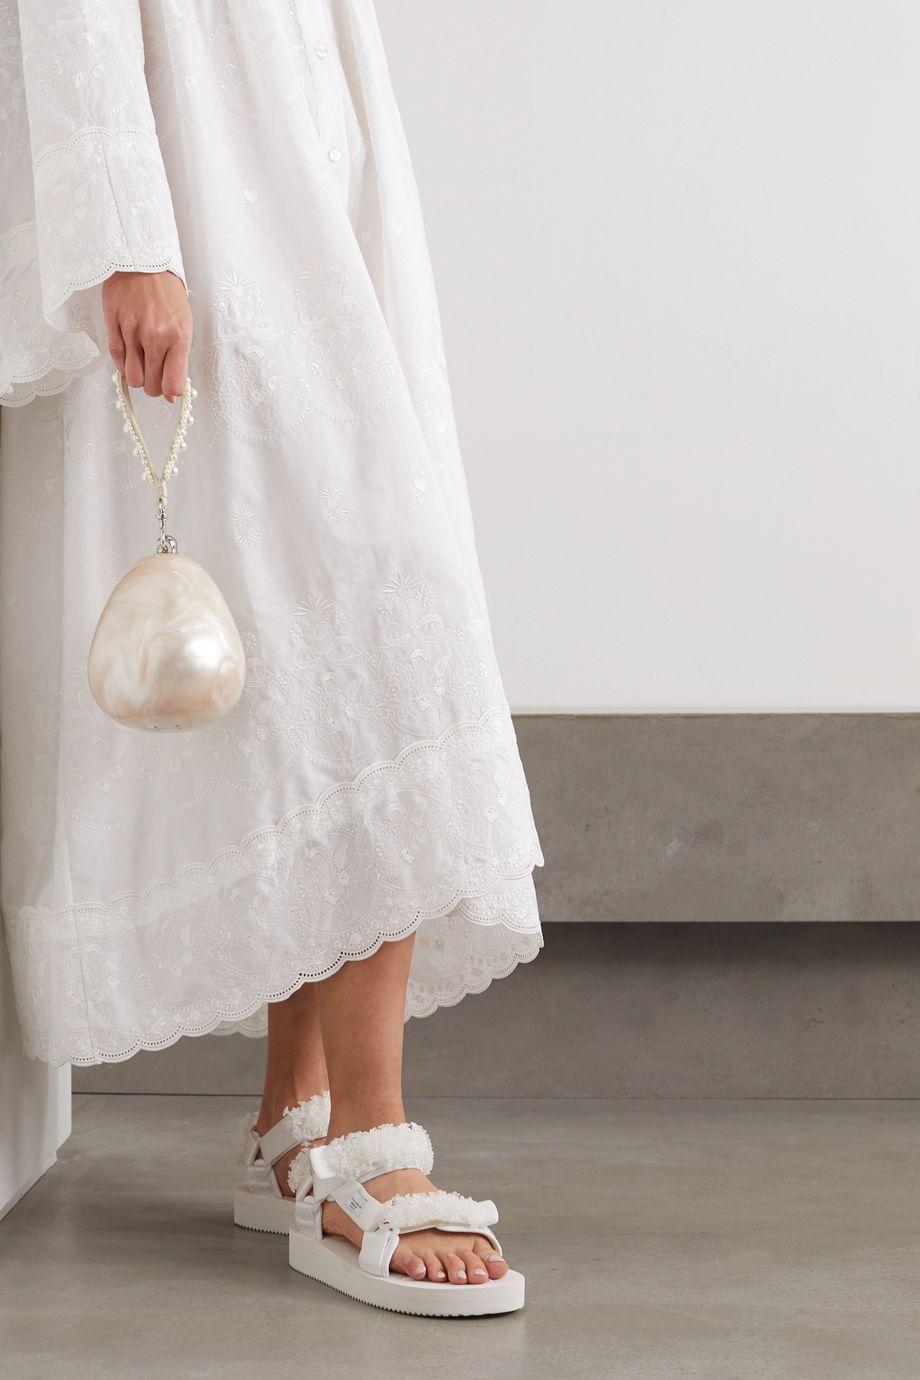 Simone Rocha 人造珍珠缀饰大理石纹亚克力手提包